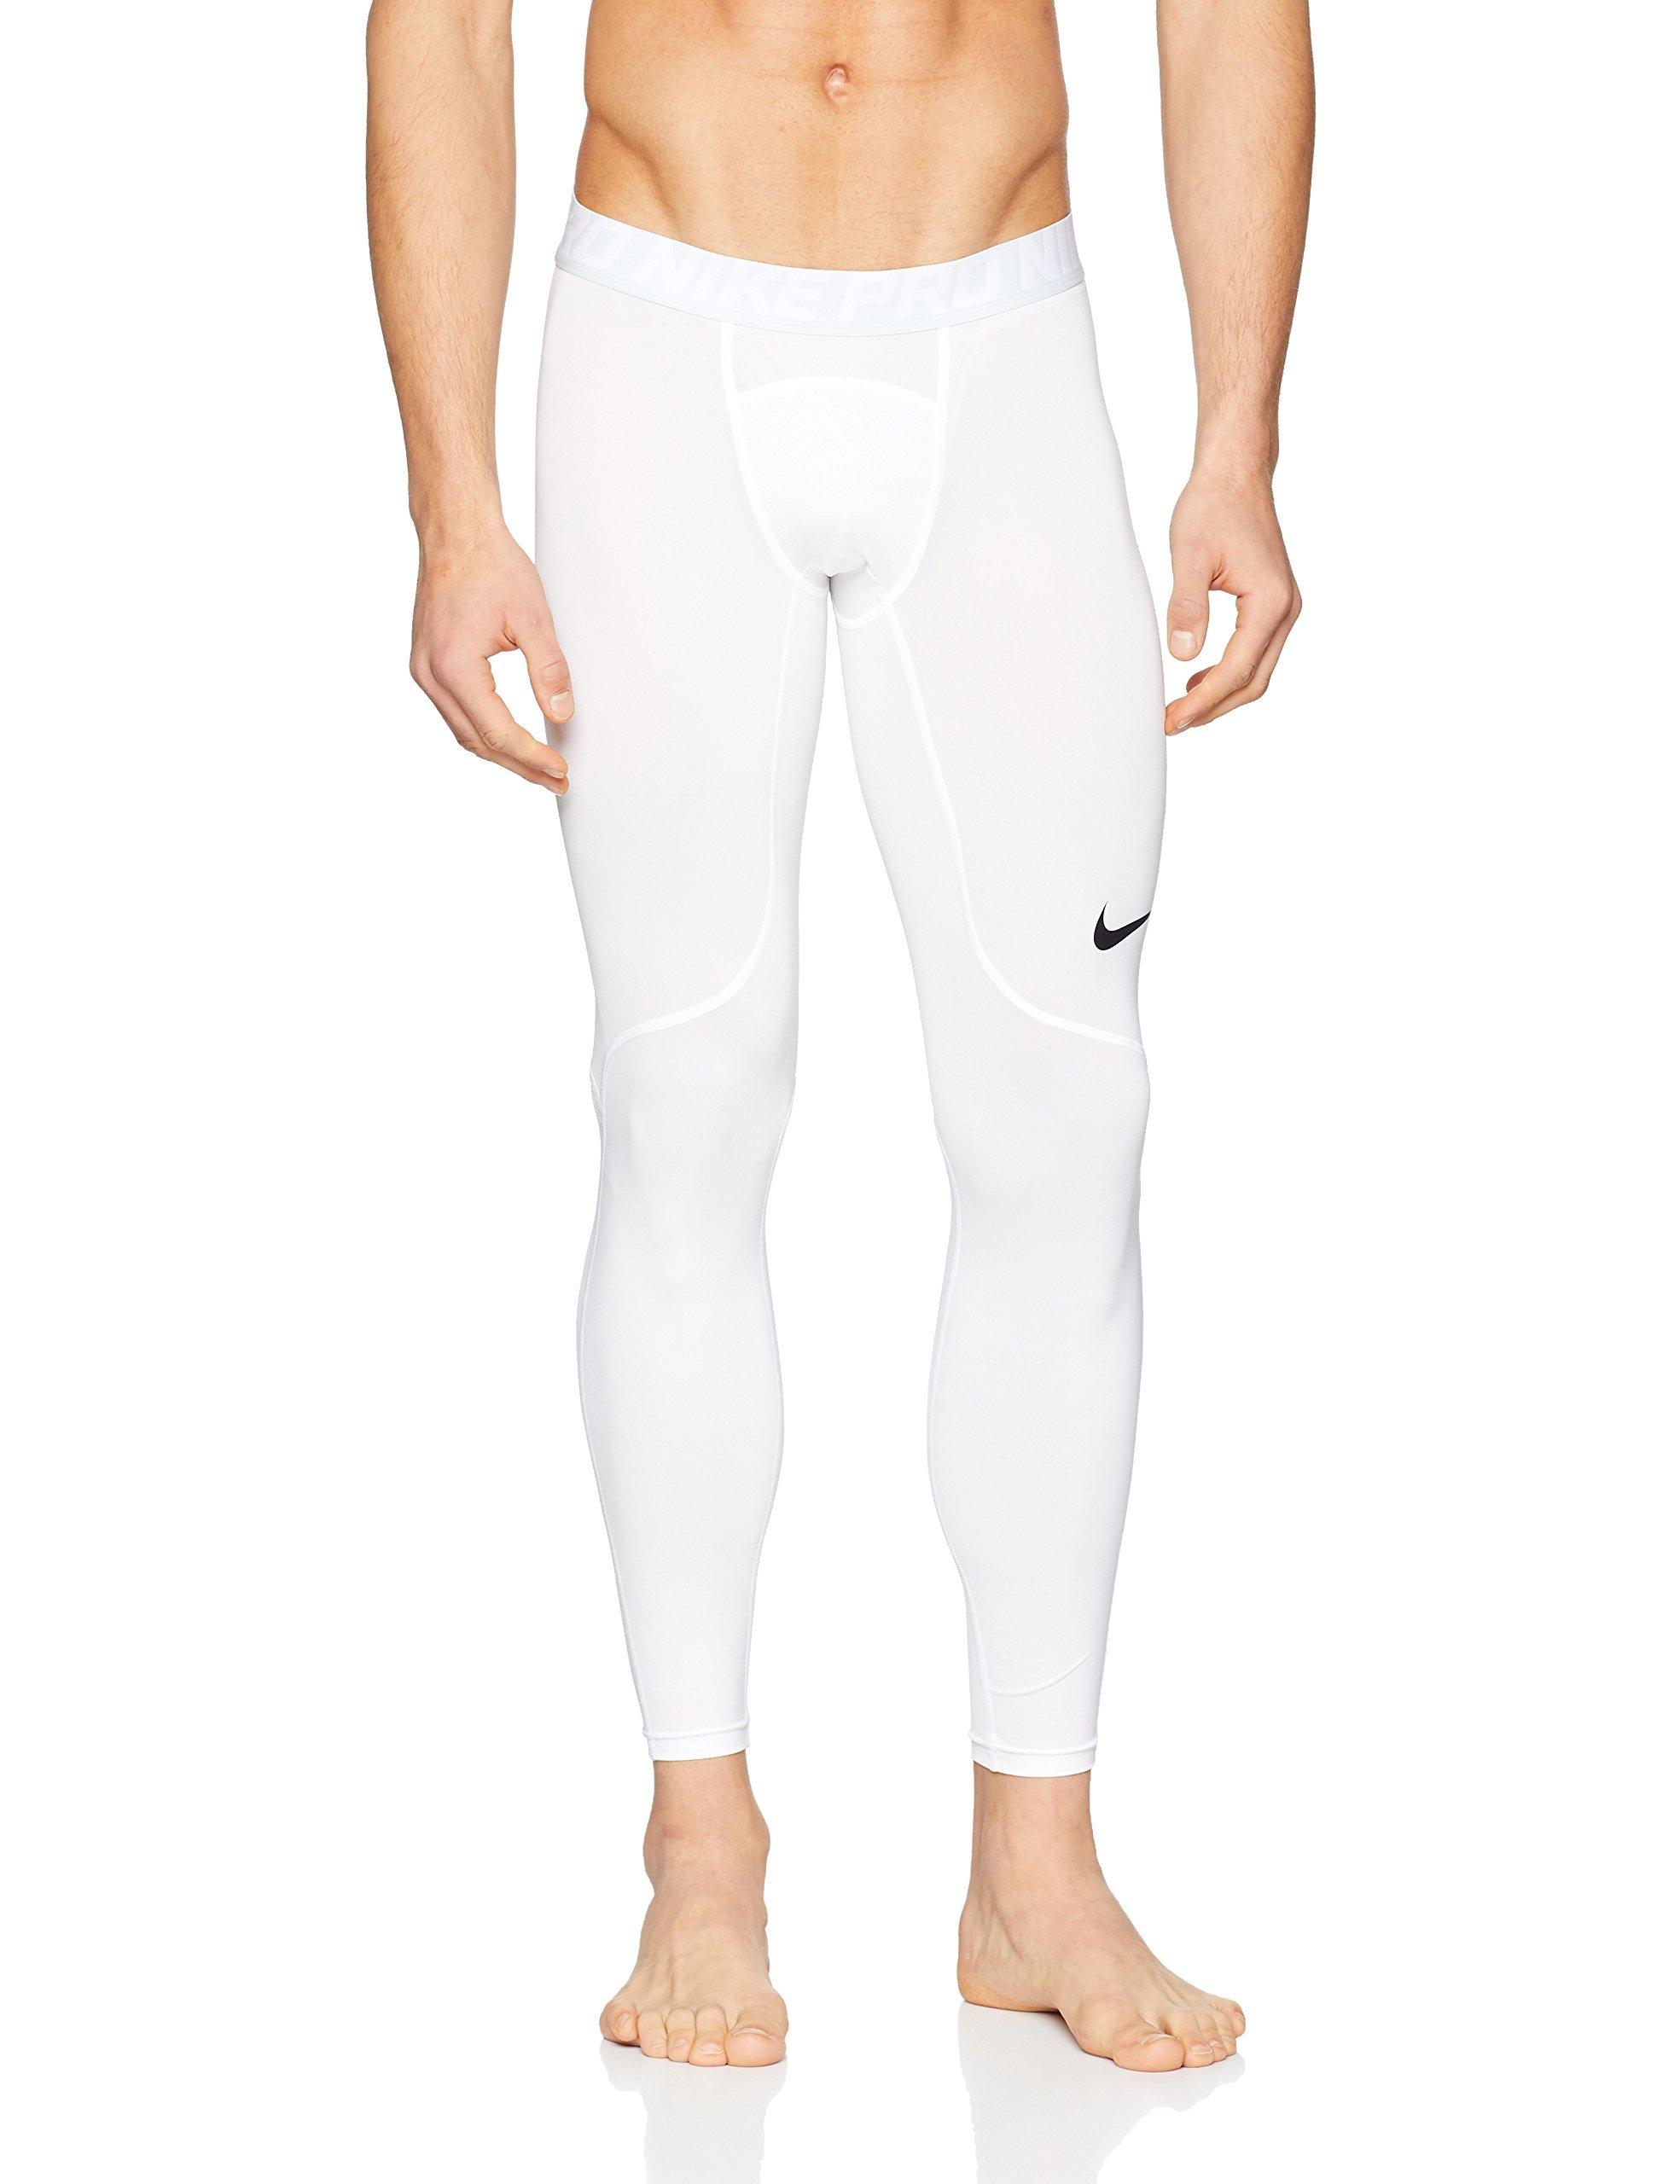 Nike Men's Pro Tights (White, M)